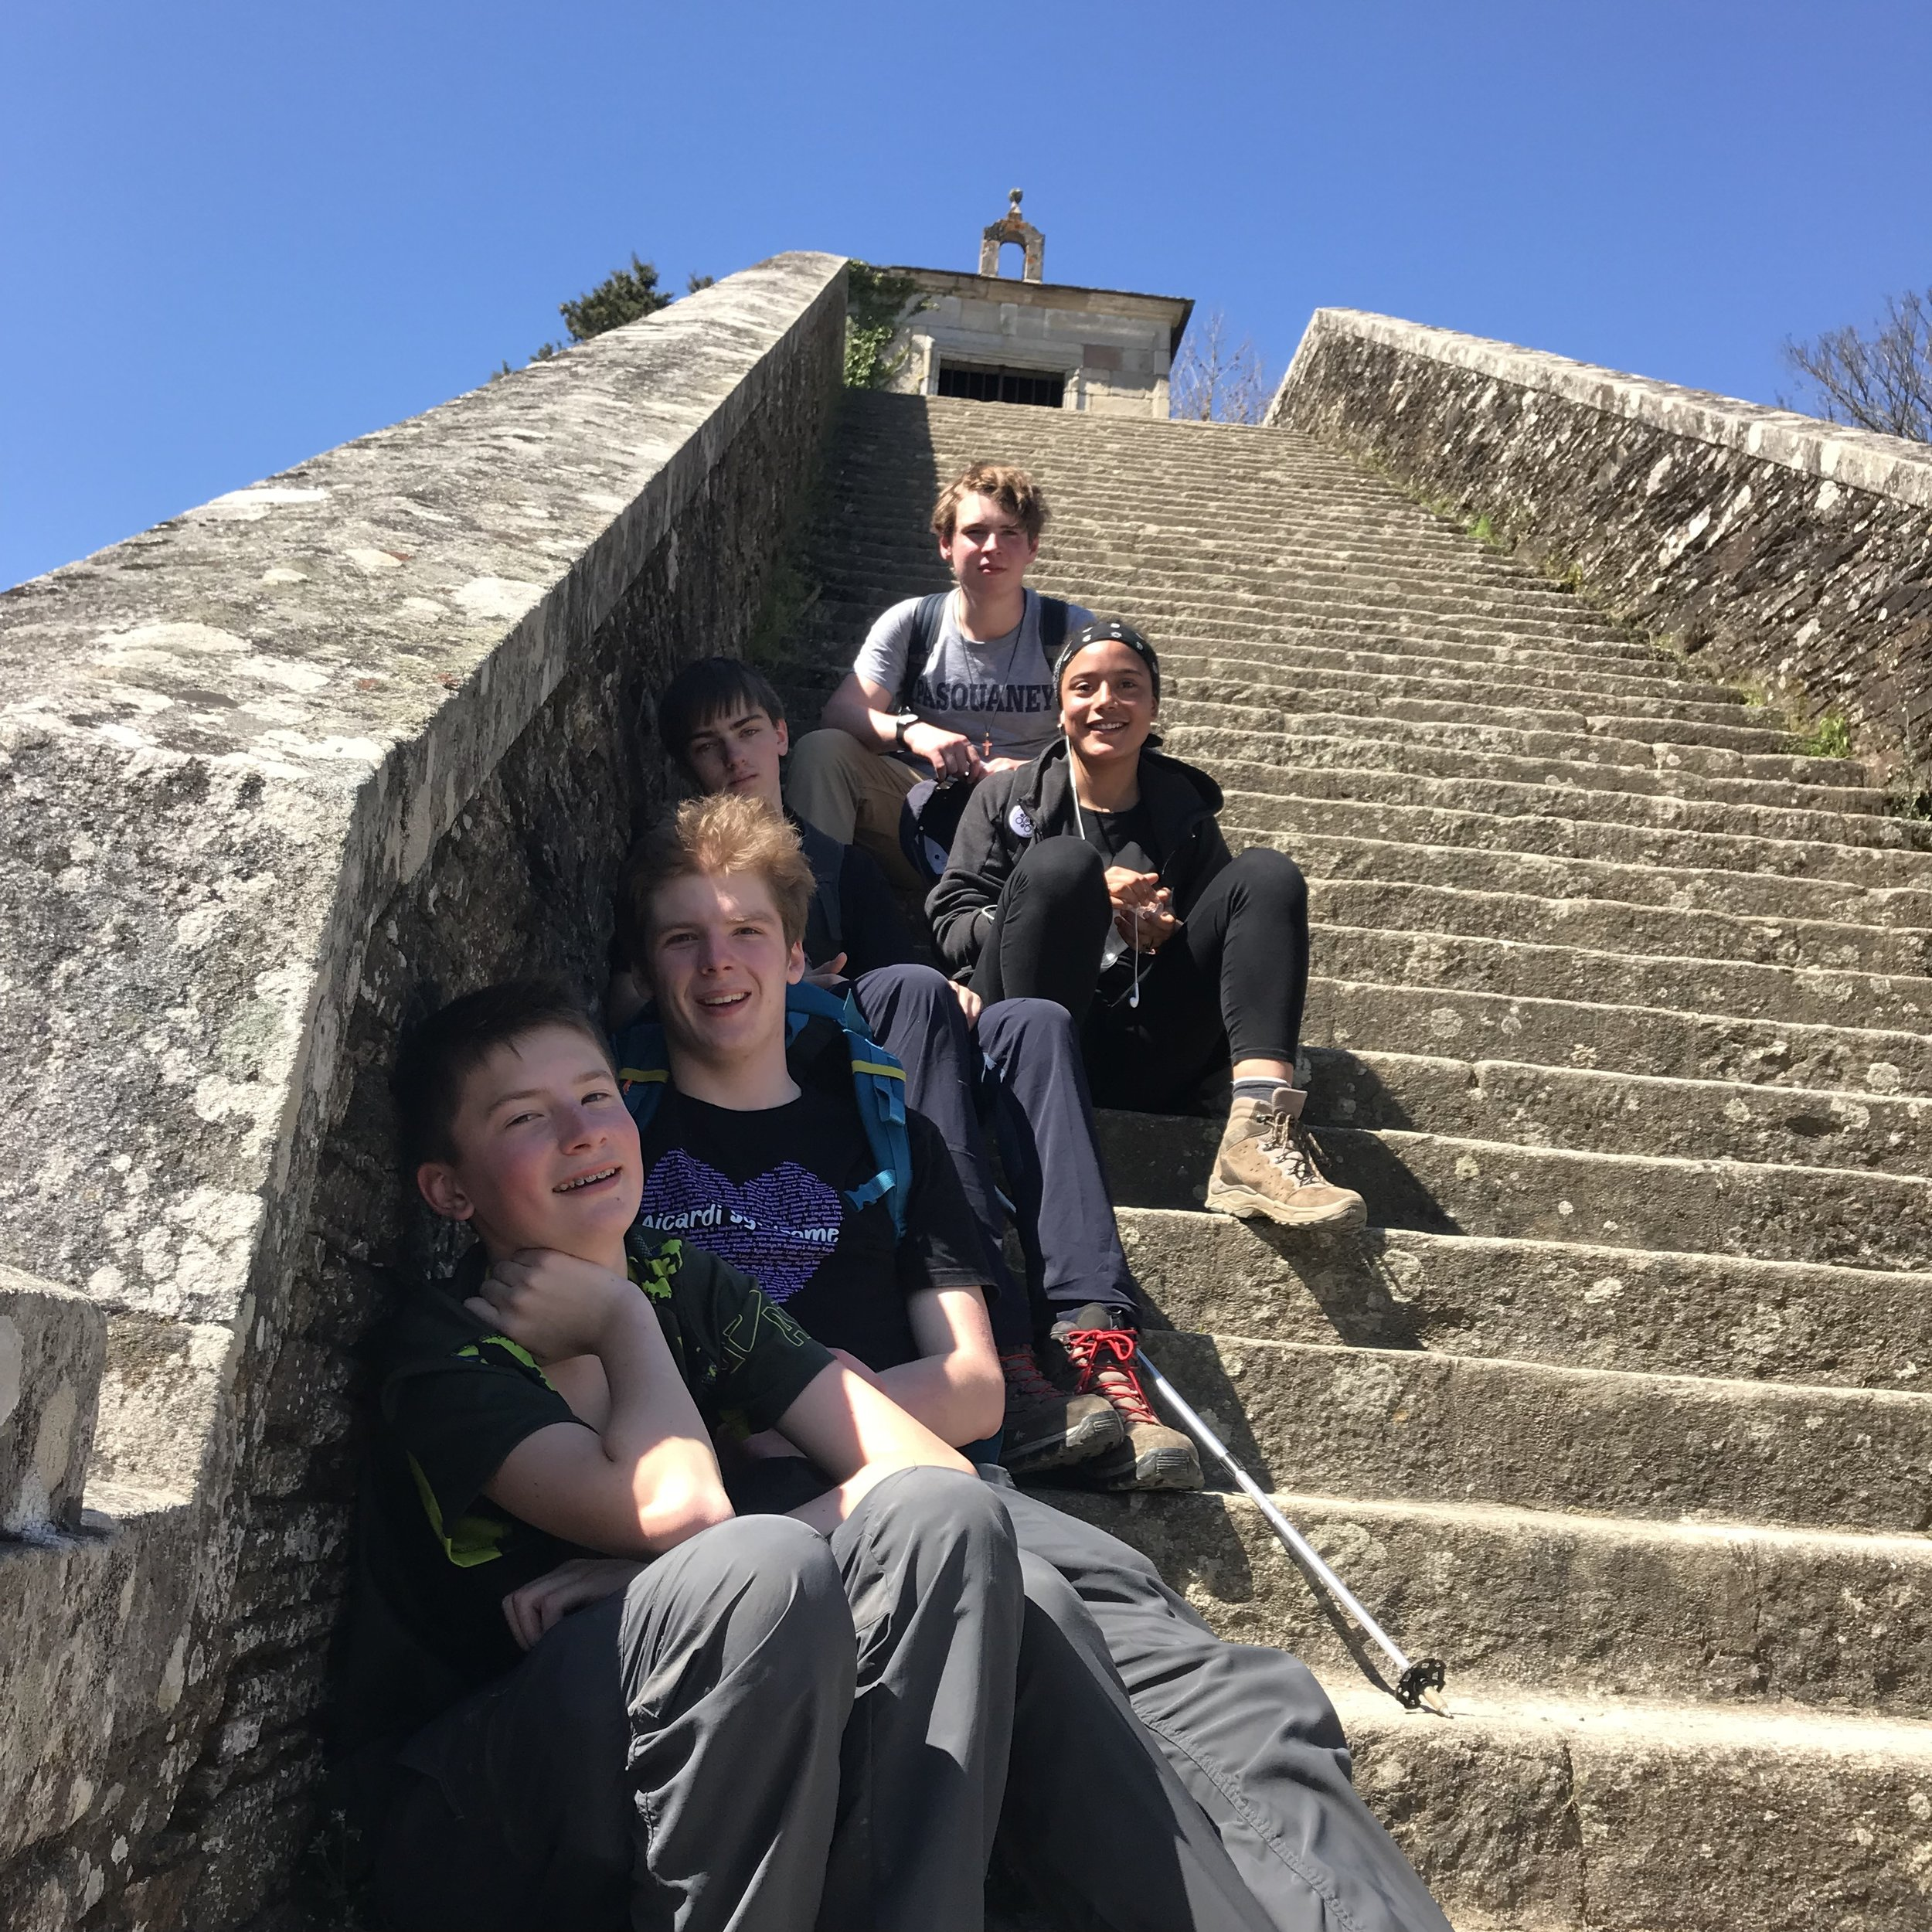 Youth pilgrimage to Santiago de Compostela, May 2018